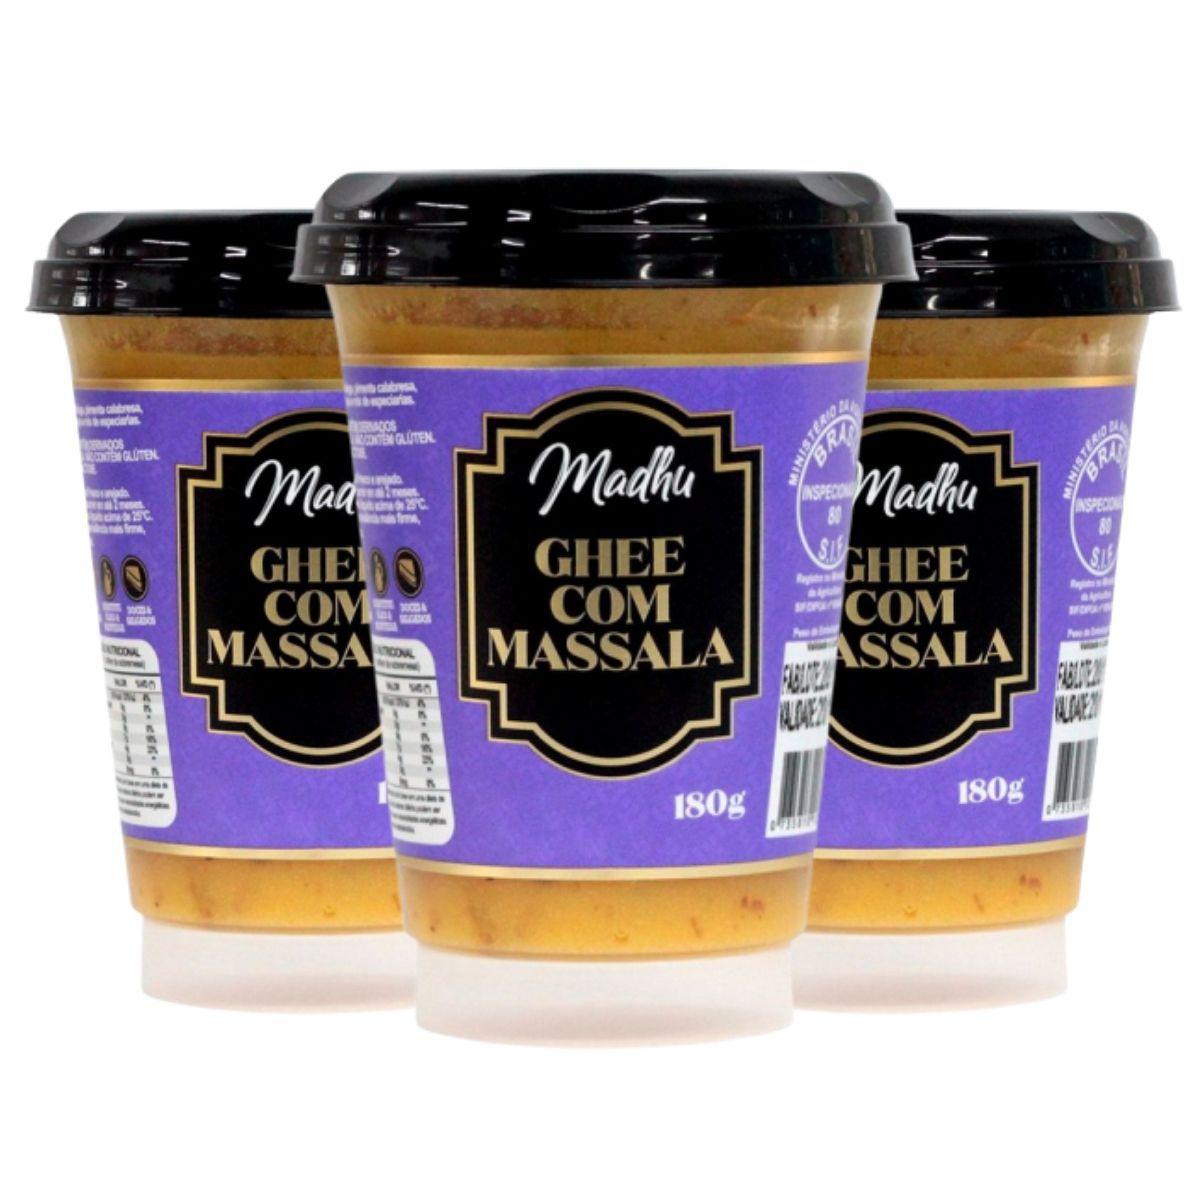 Kit 3 Manteigas Ghee C/ Massala Clarificada 180g - Madhu Bakery